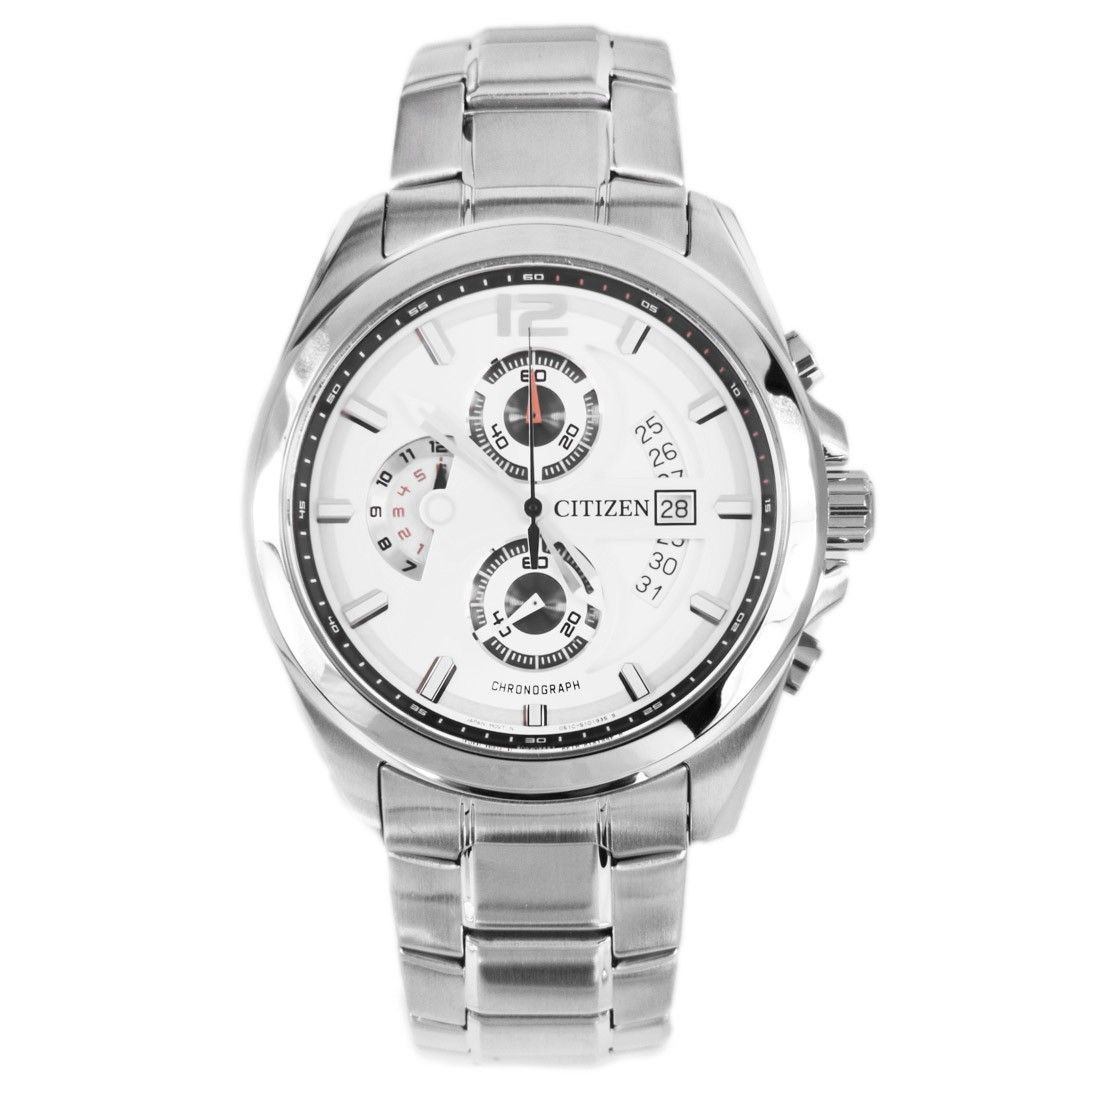 Citizen Chronograph Tachymeter Mens Sports Watch An3420 51a Ca4280 53e